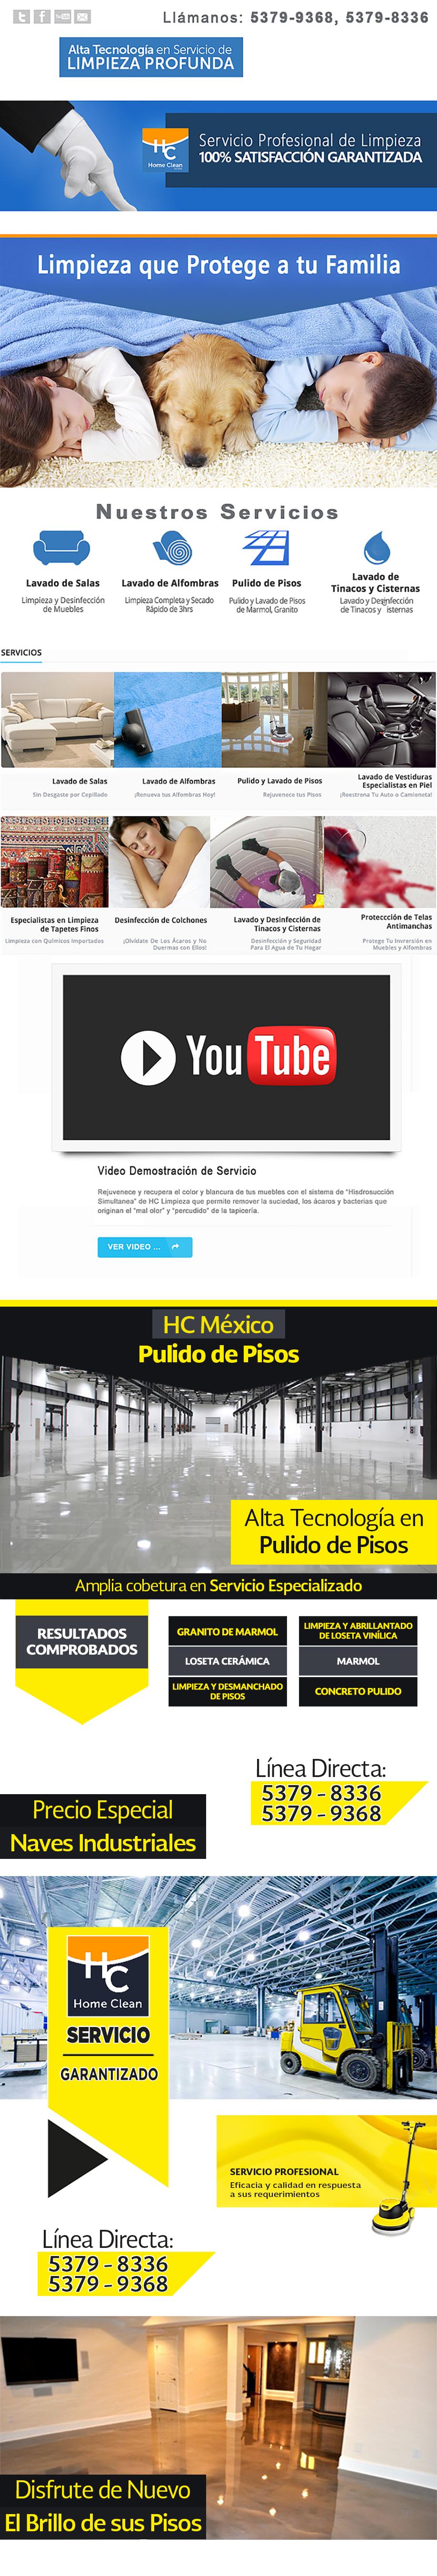 ANCHO - - CASA + PULIDO DE PISOS